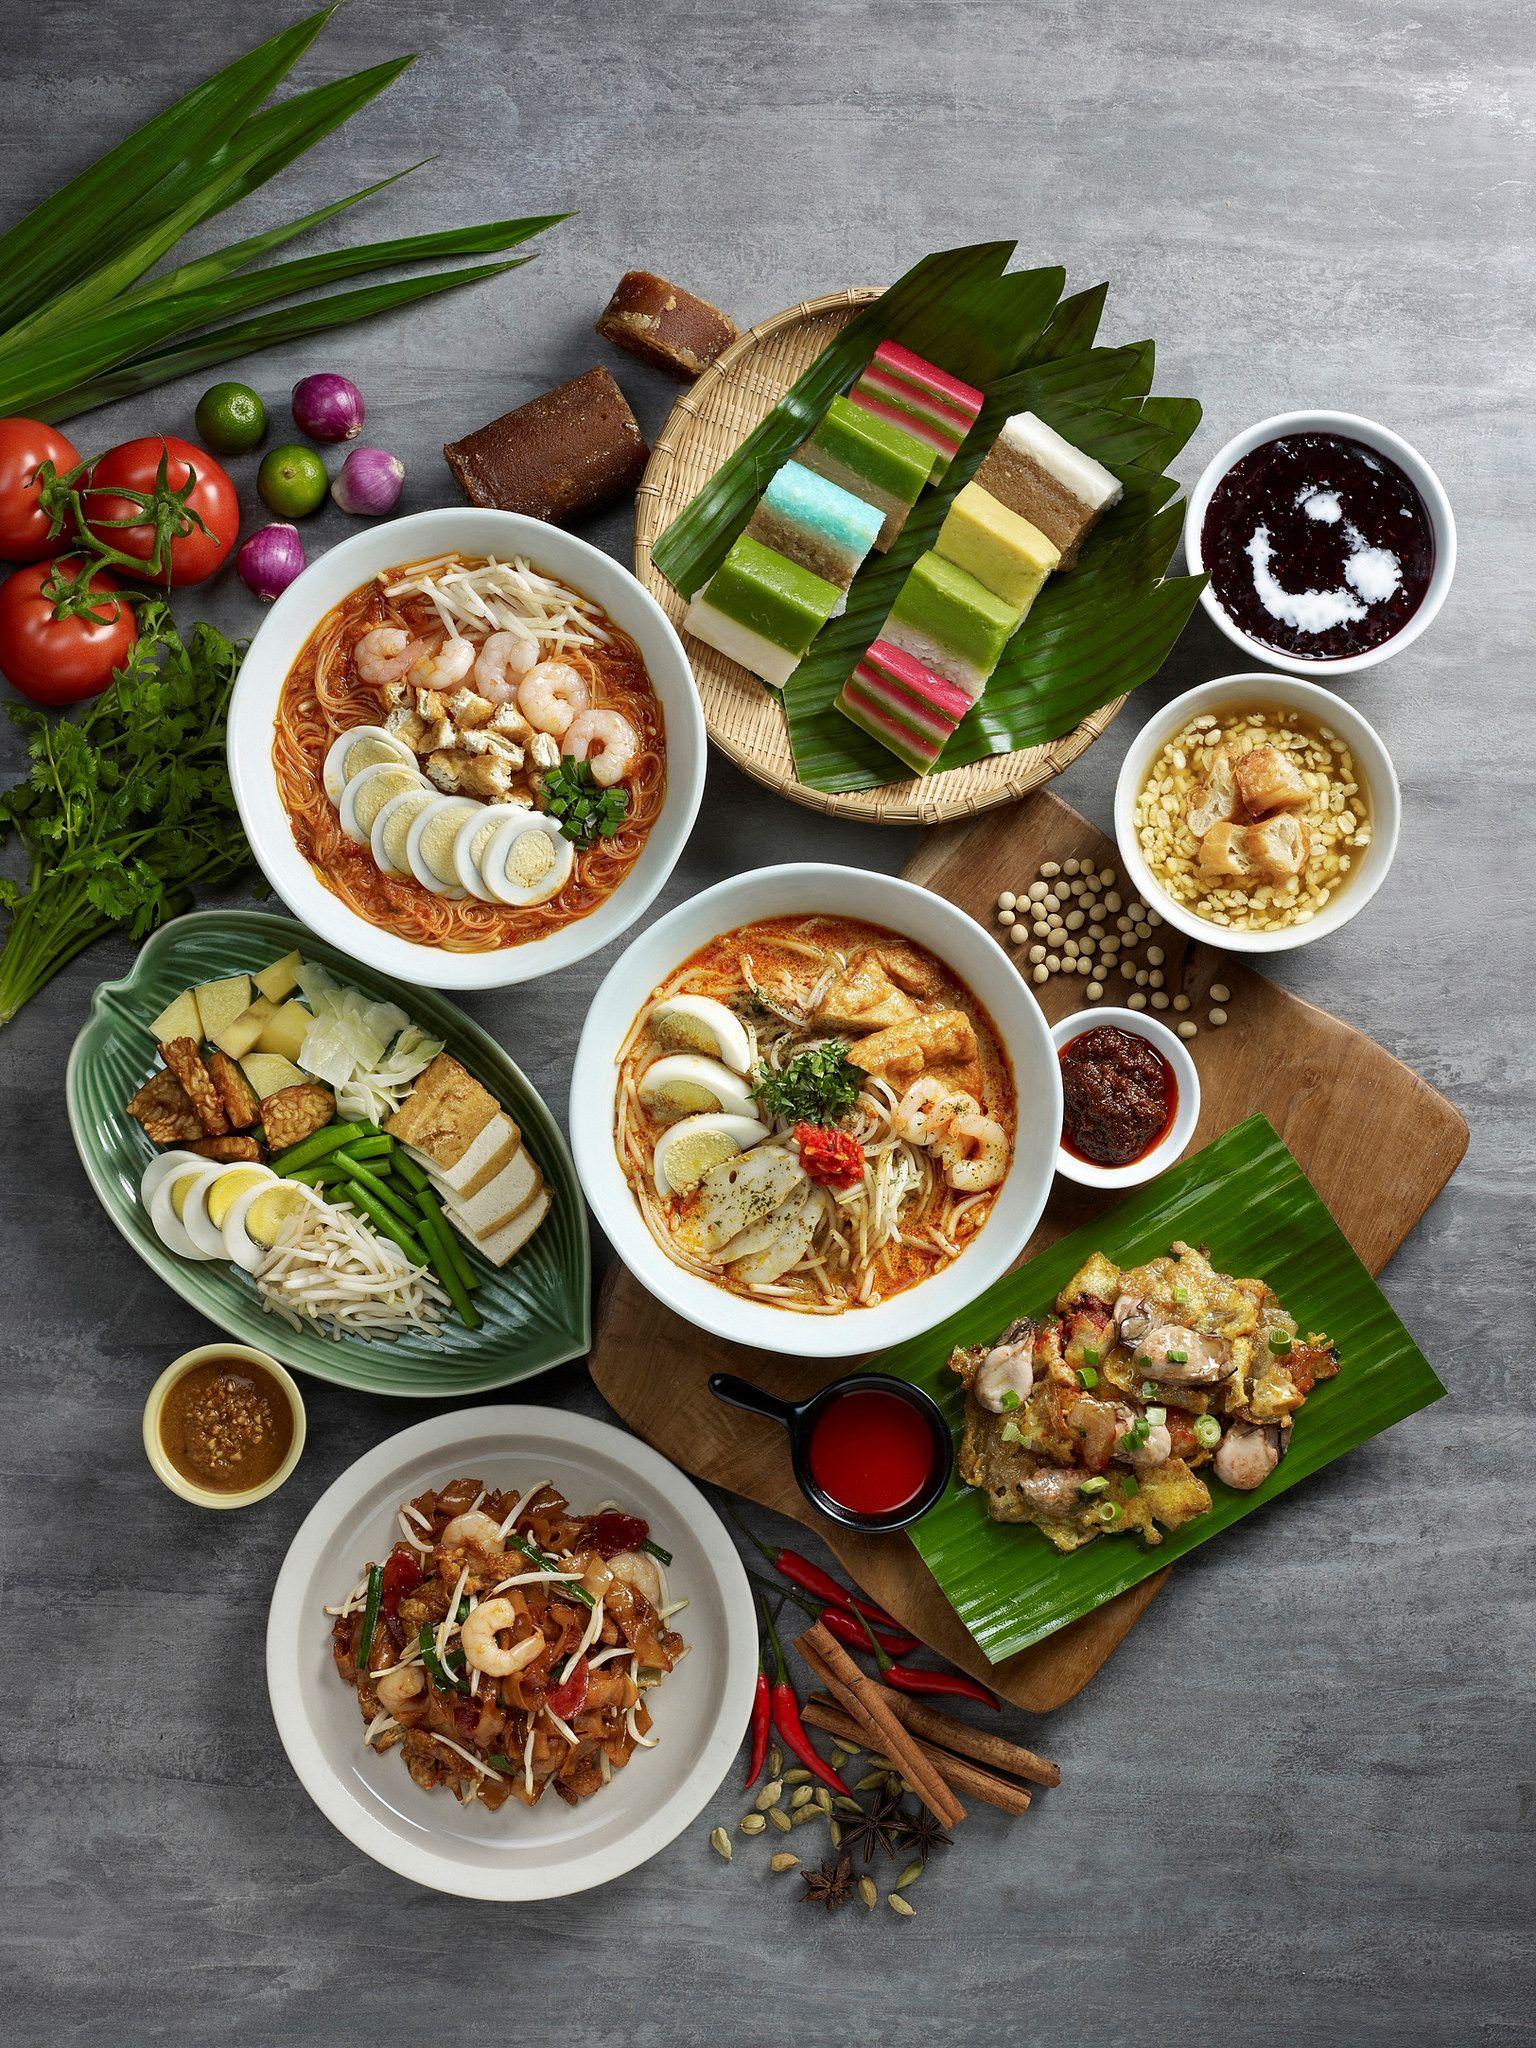 Lasak #thaicuisine #asiame #delicious #tasty #yummy why ...